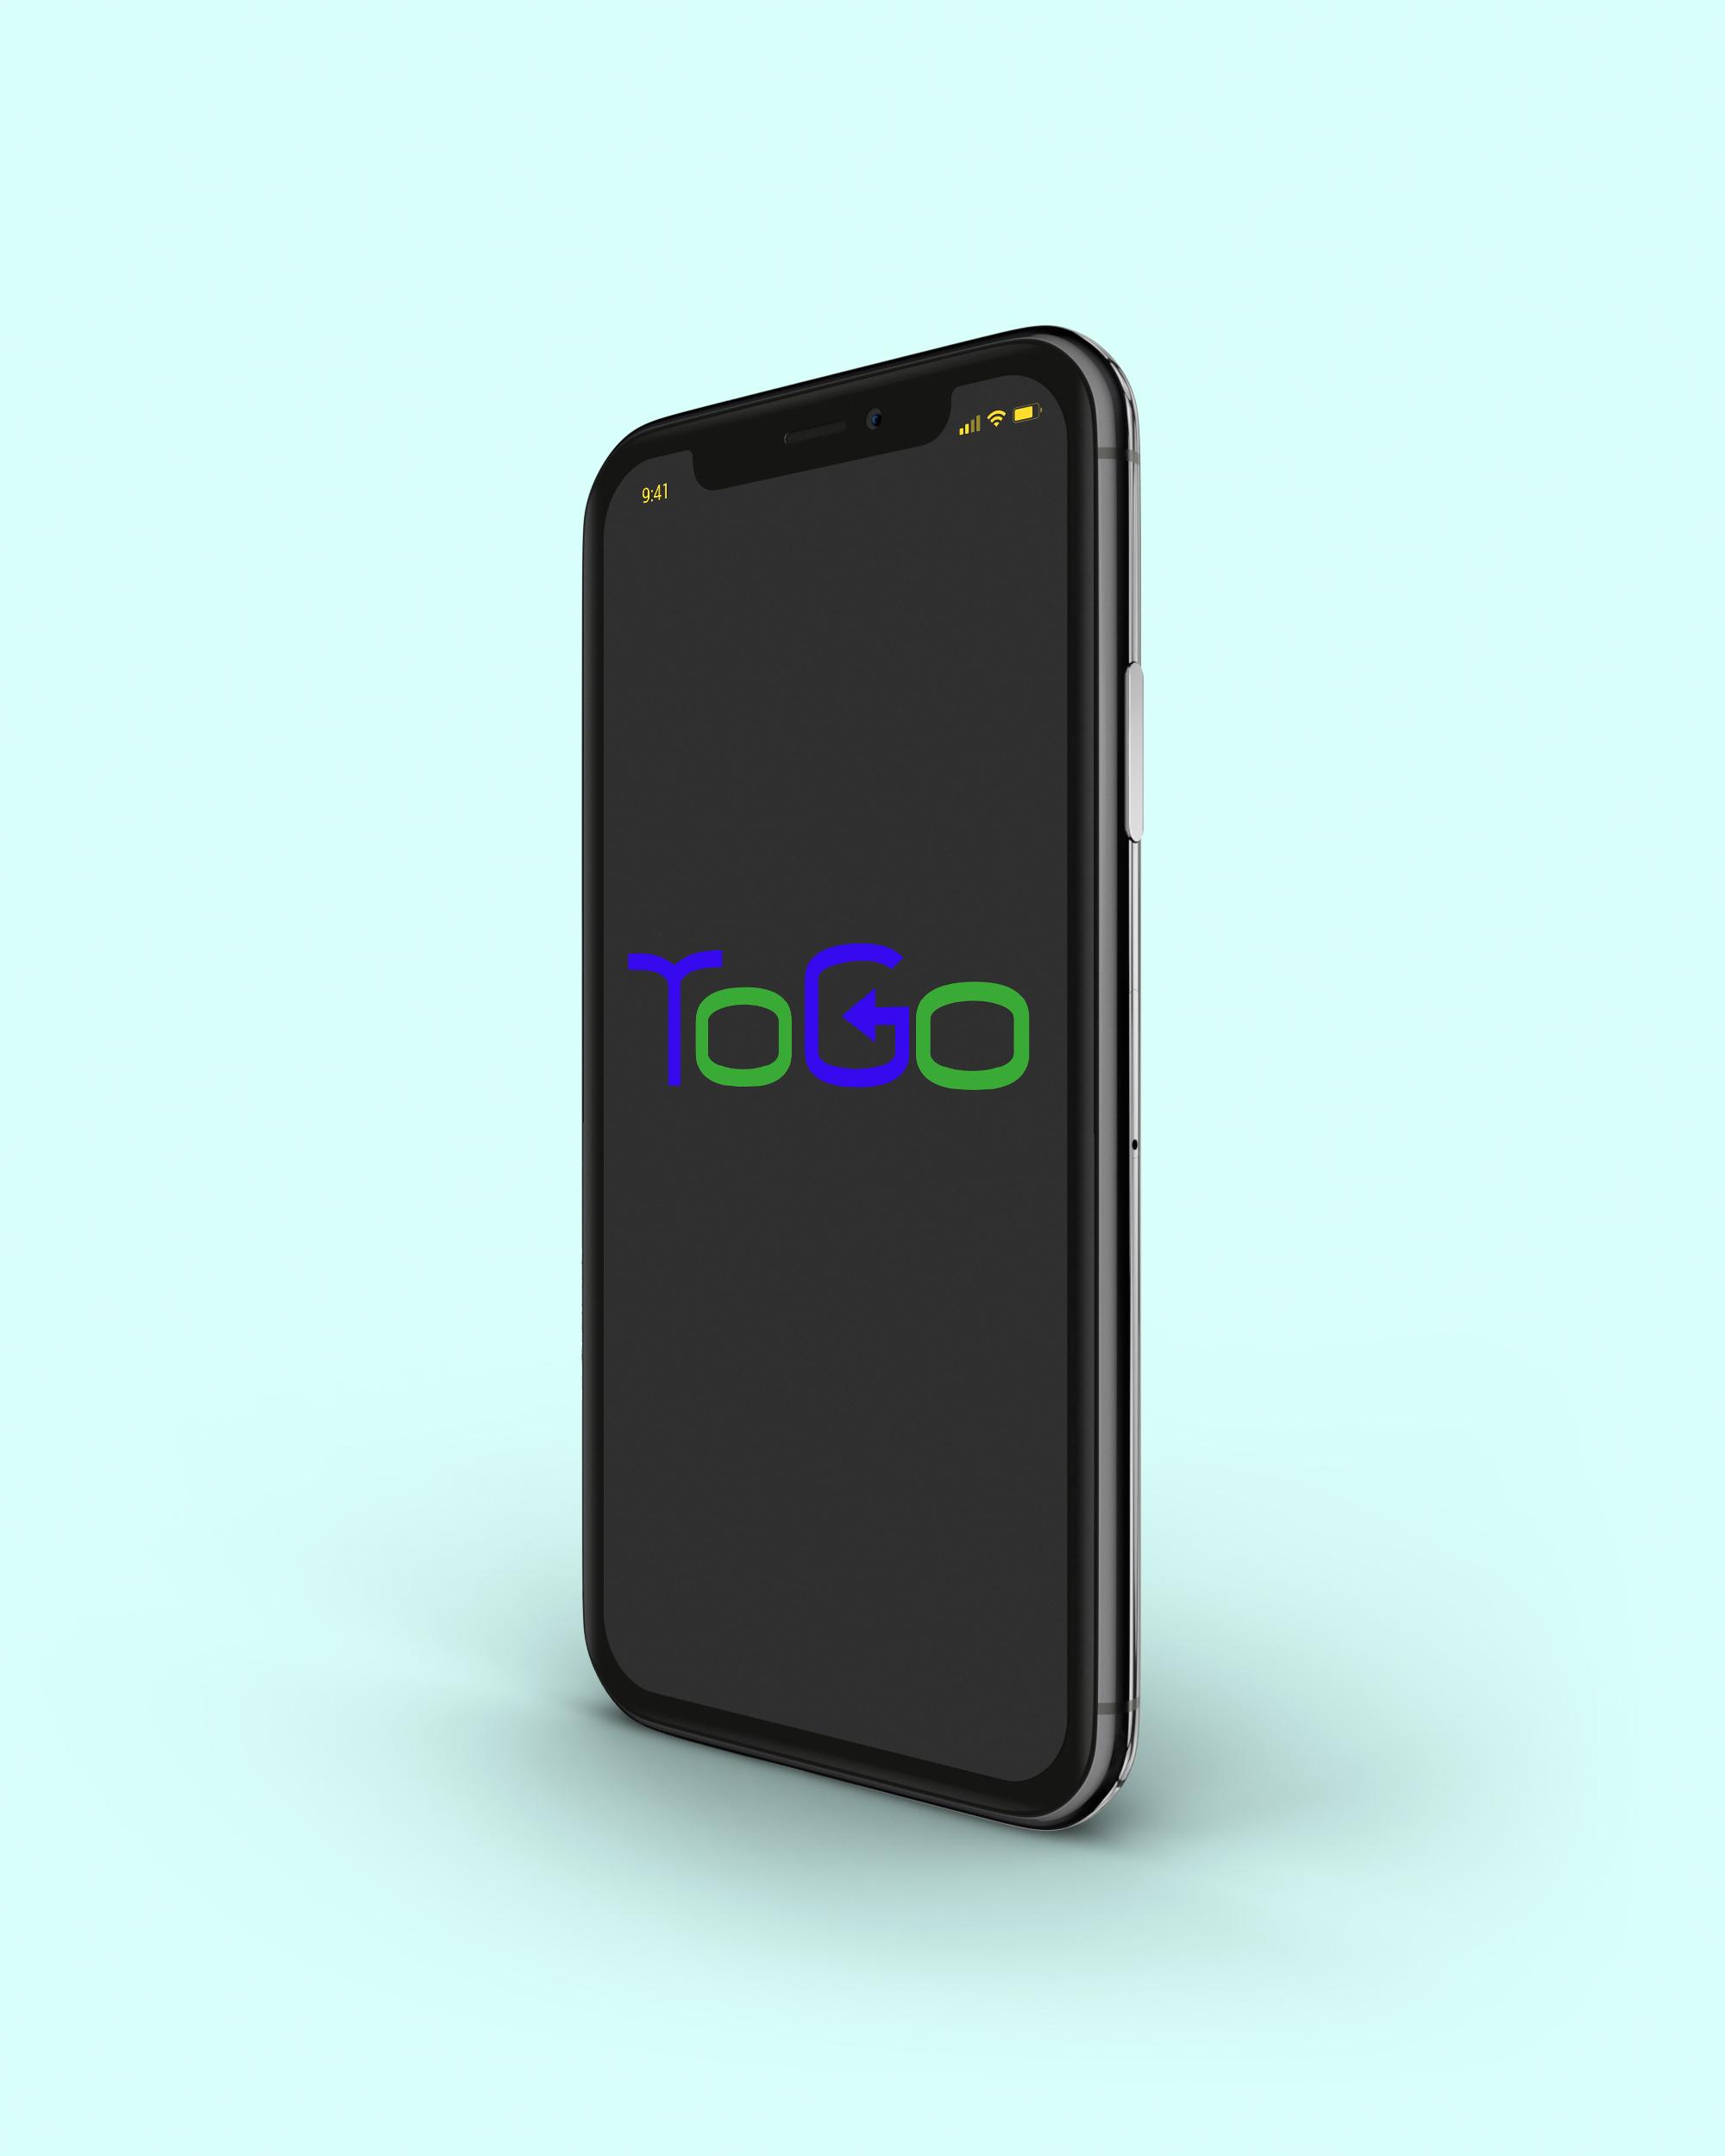 Разработать логотип и экран загрузки приложения фото f_9695aab9a63daf2c.jpg